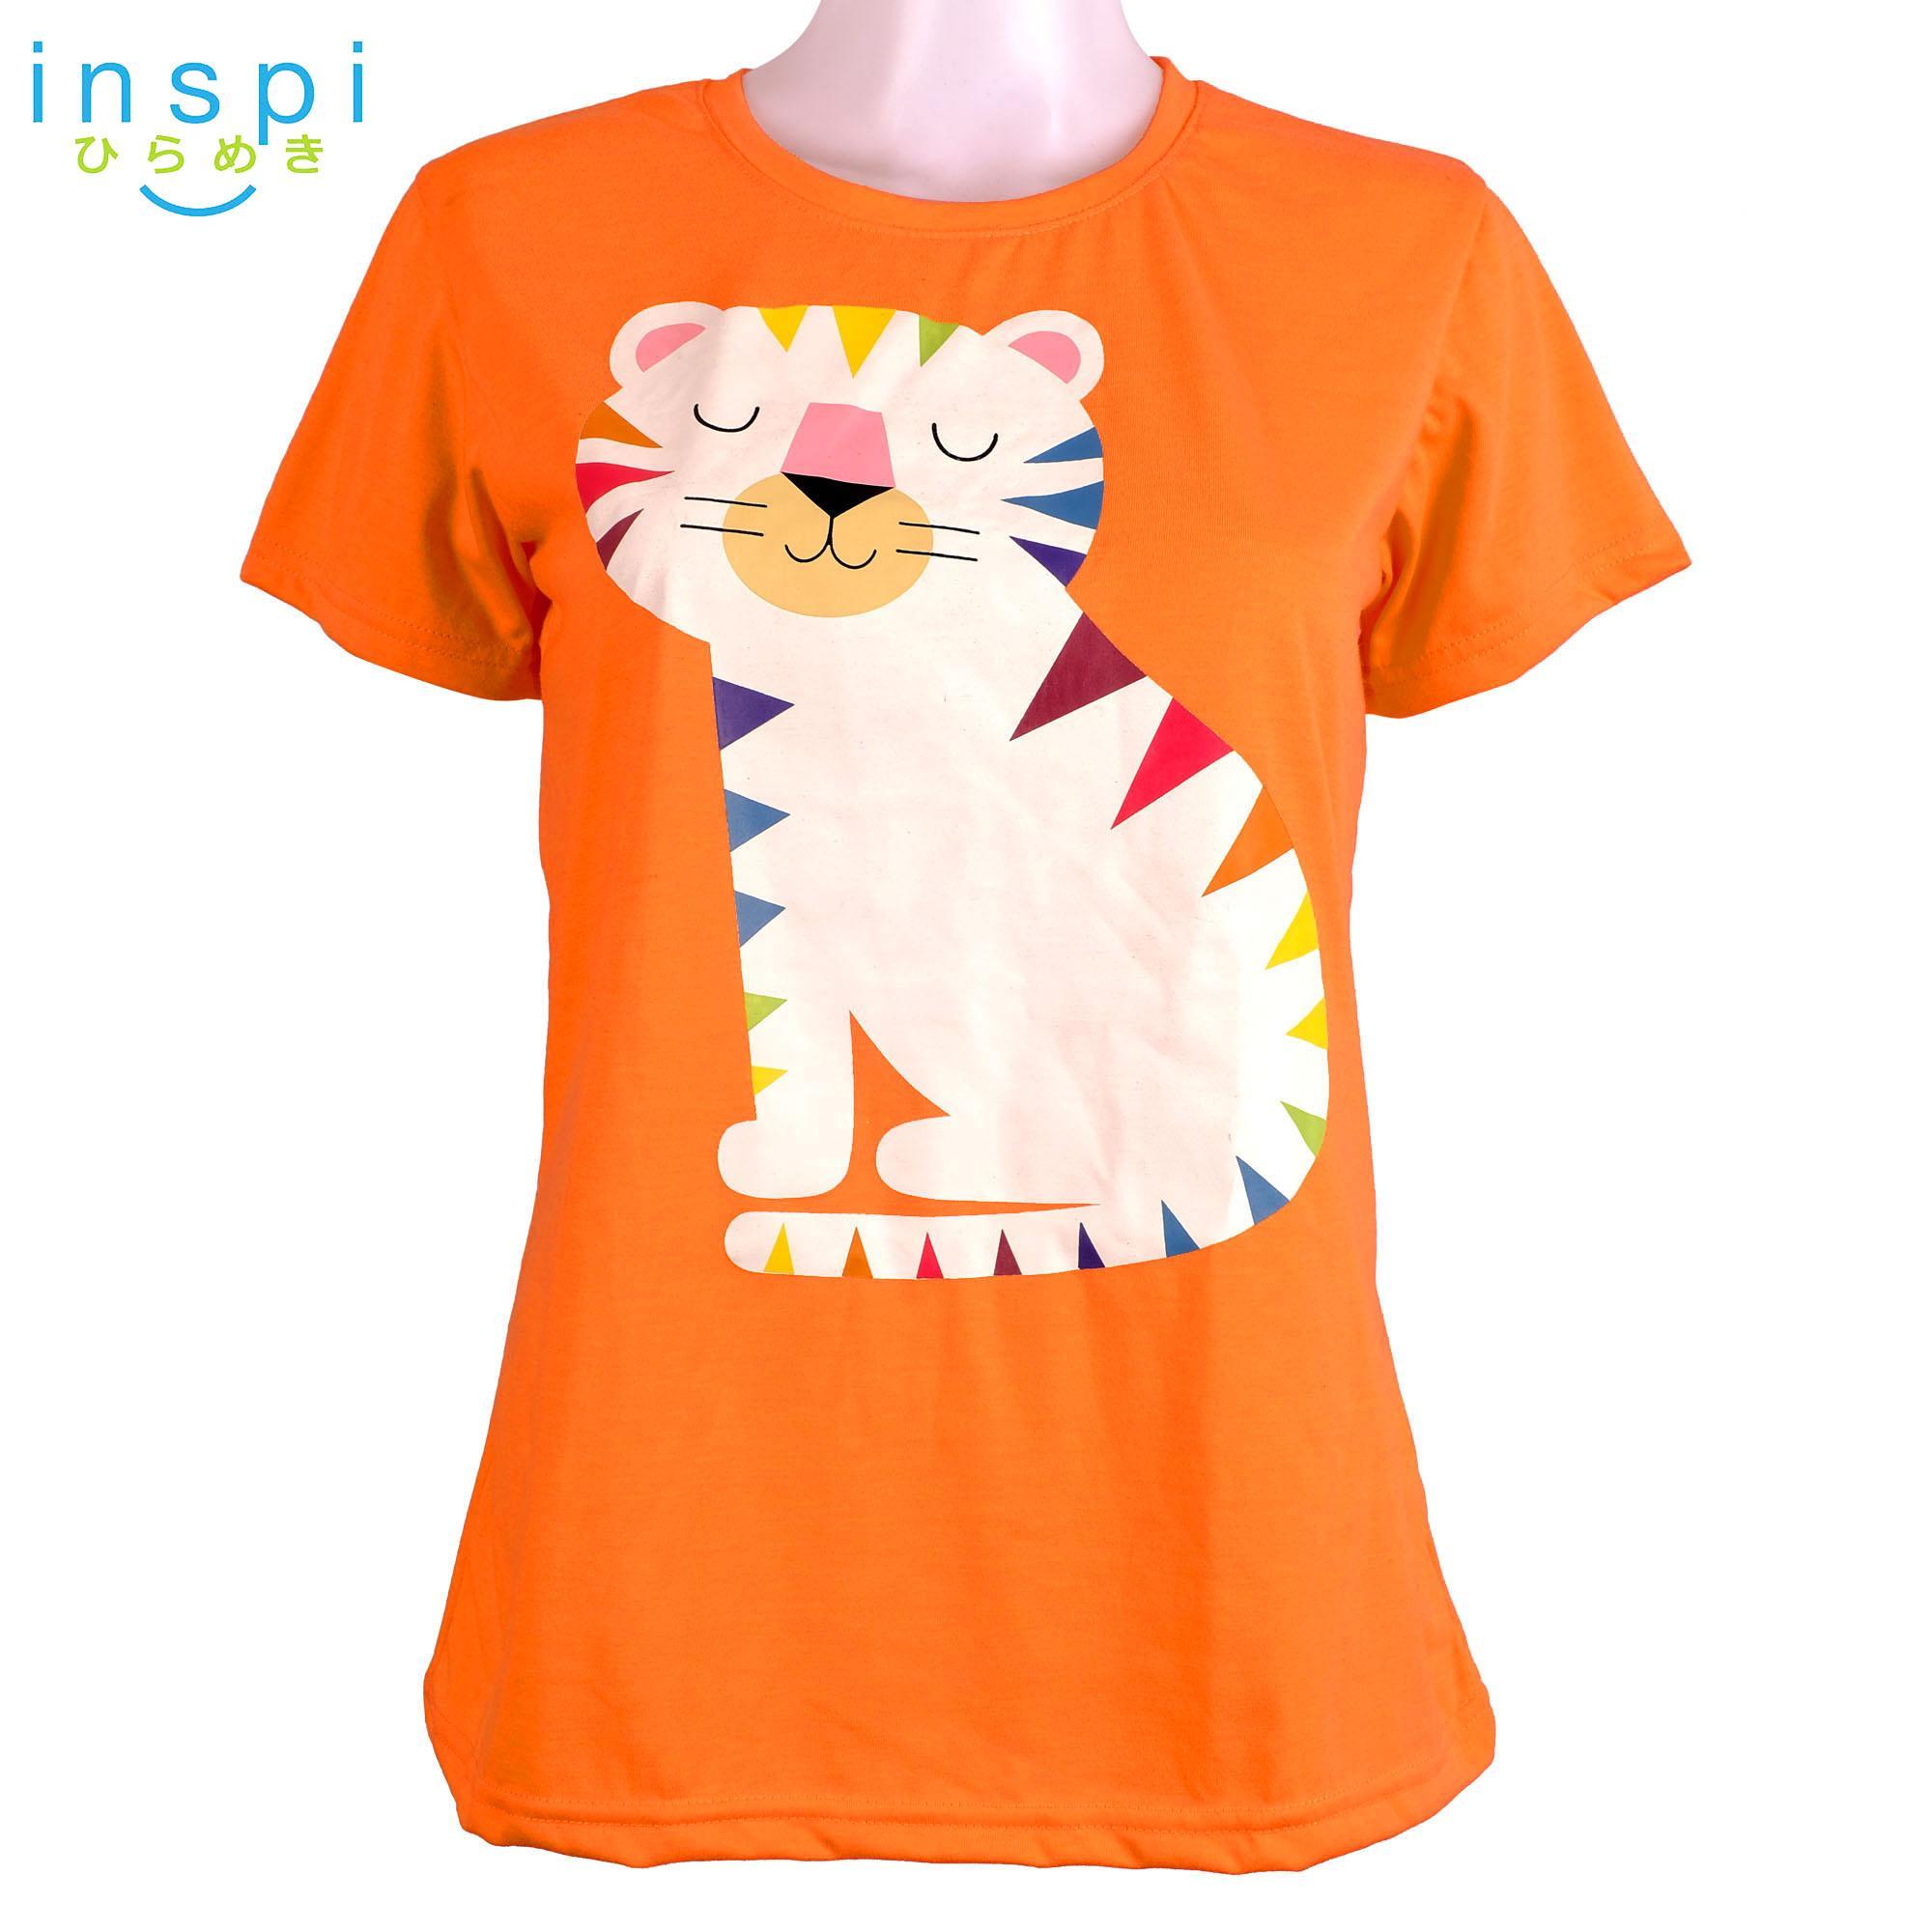 INSPI Tees Ladies Loose Fit Rainbow Cat (Orange) tshirt printed graphic tee  t shirt shirts tshirts for Women womens sale  88153f4284